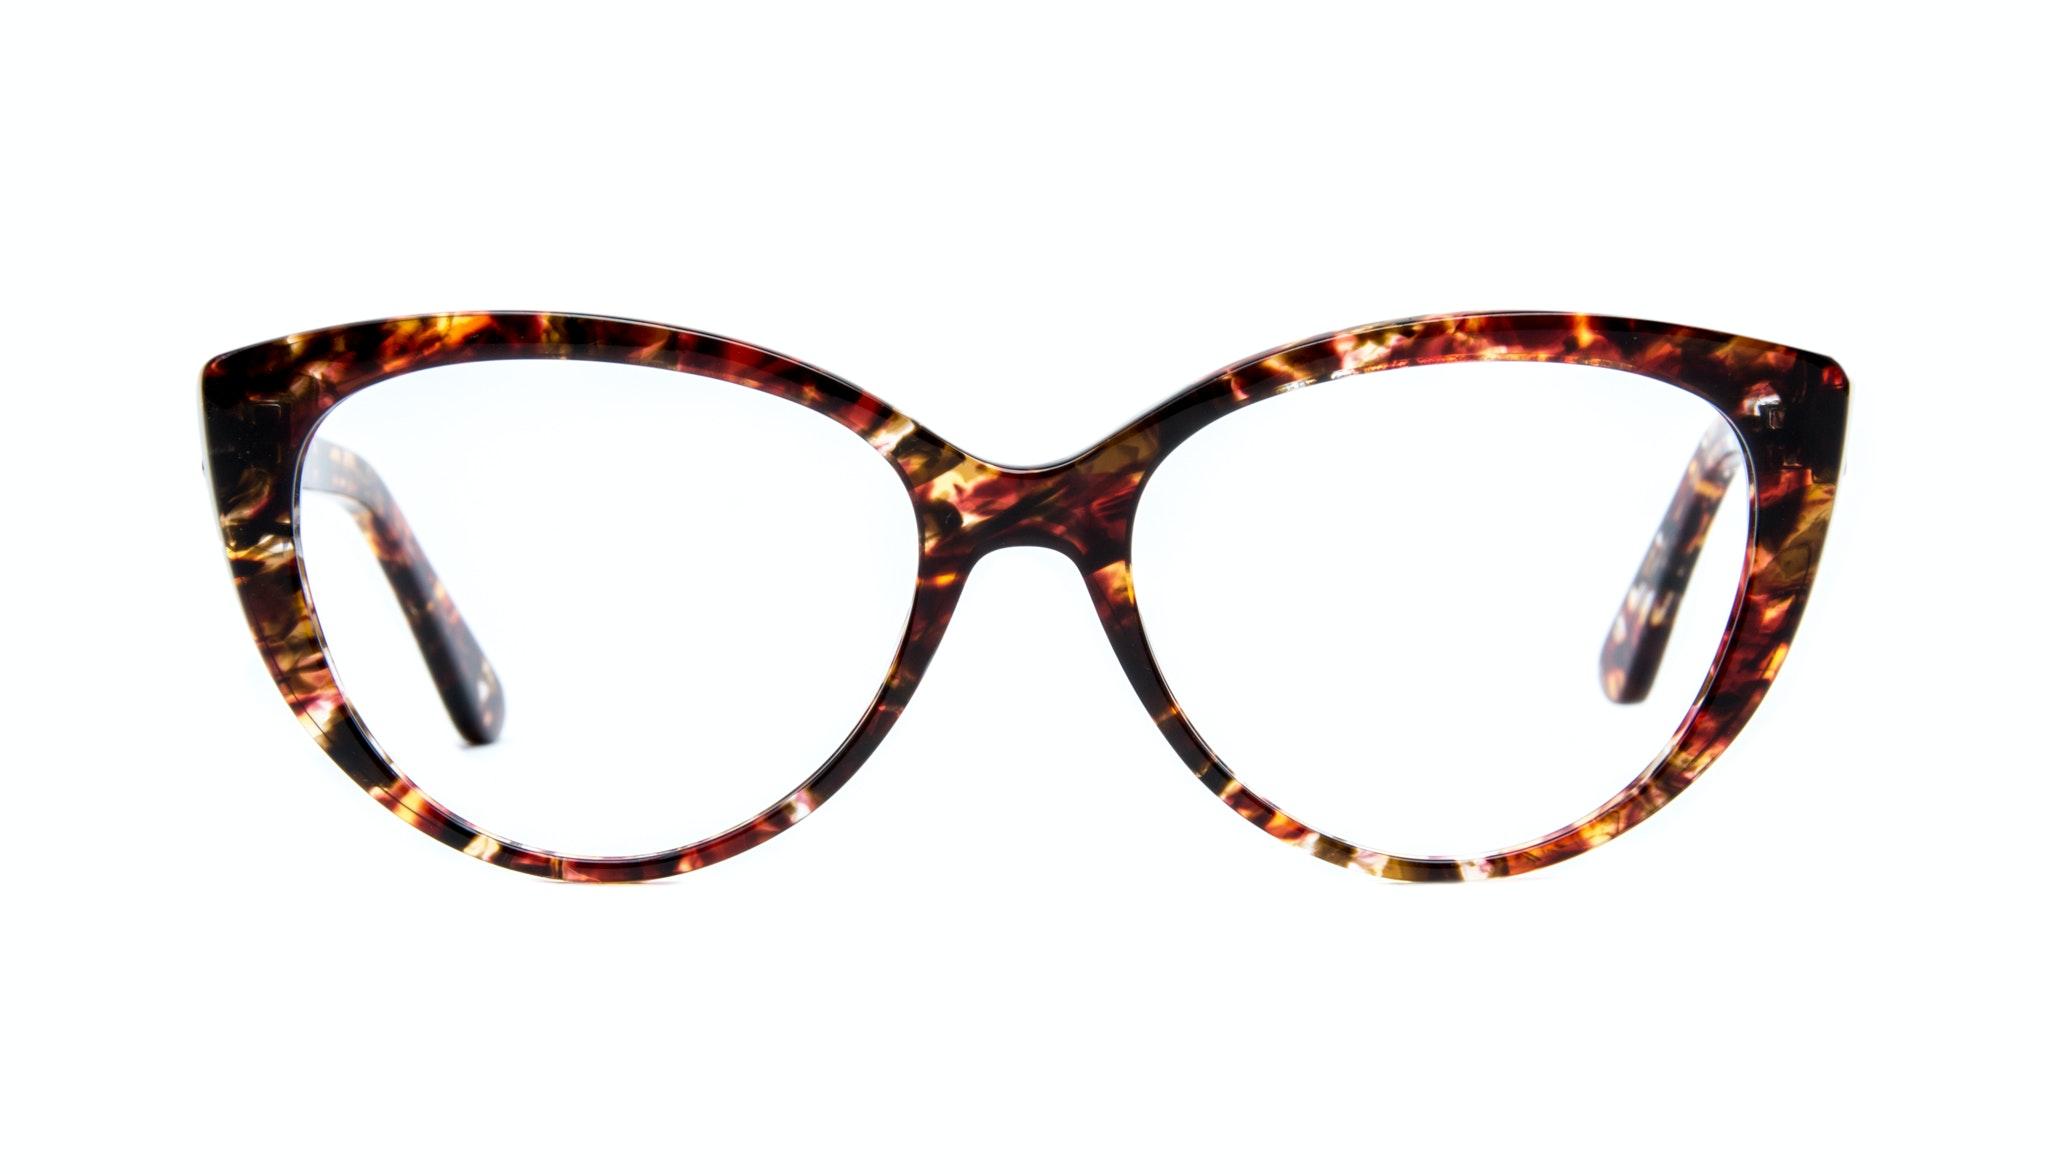 Affordable Fashion Glasses Cat Eye Eyeglasses Women Bliss lava